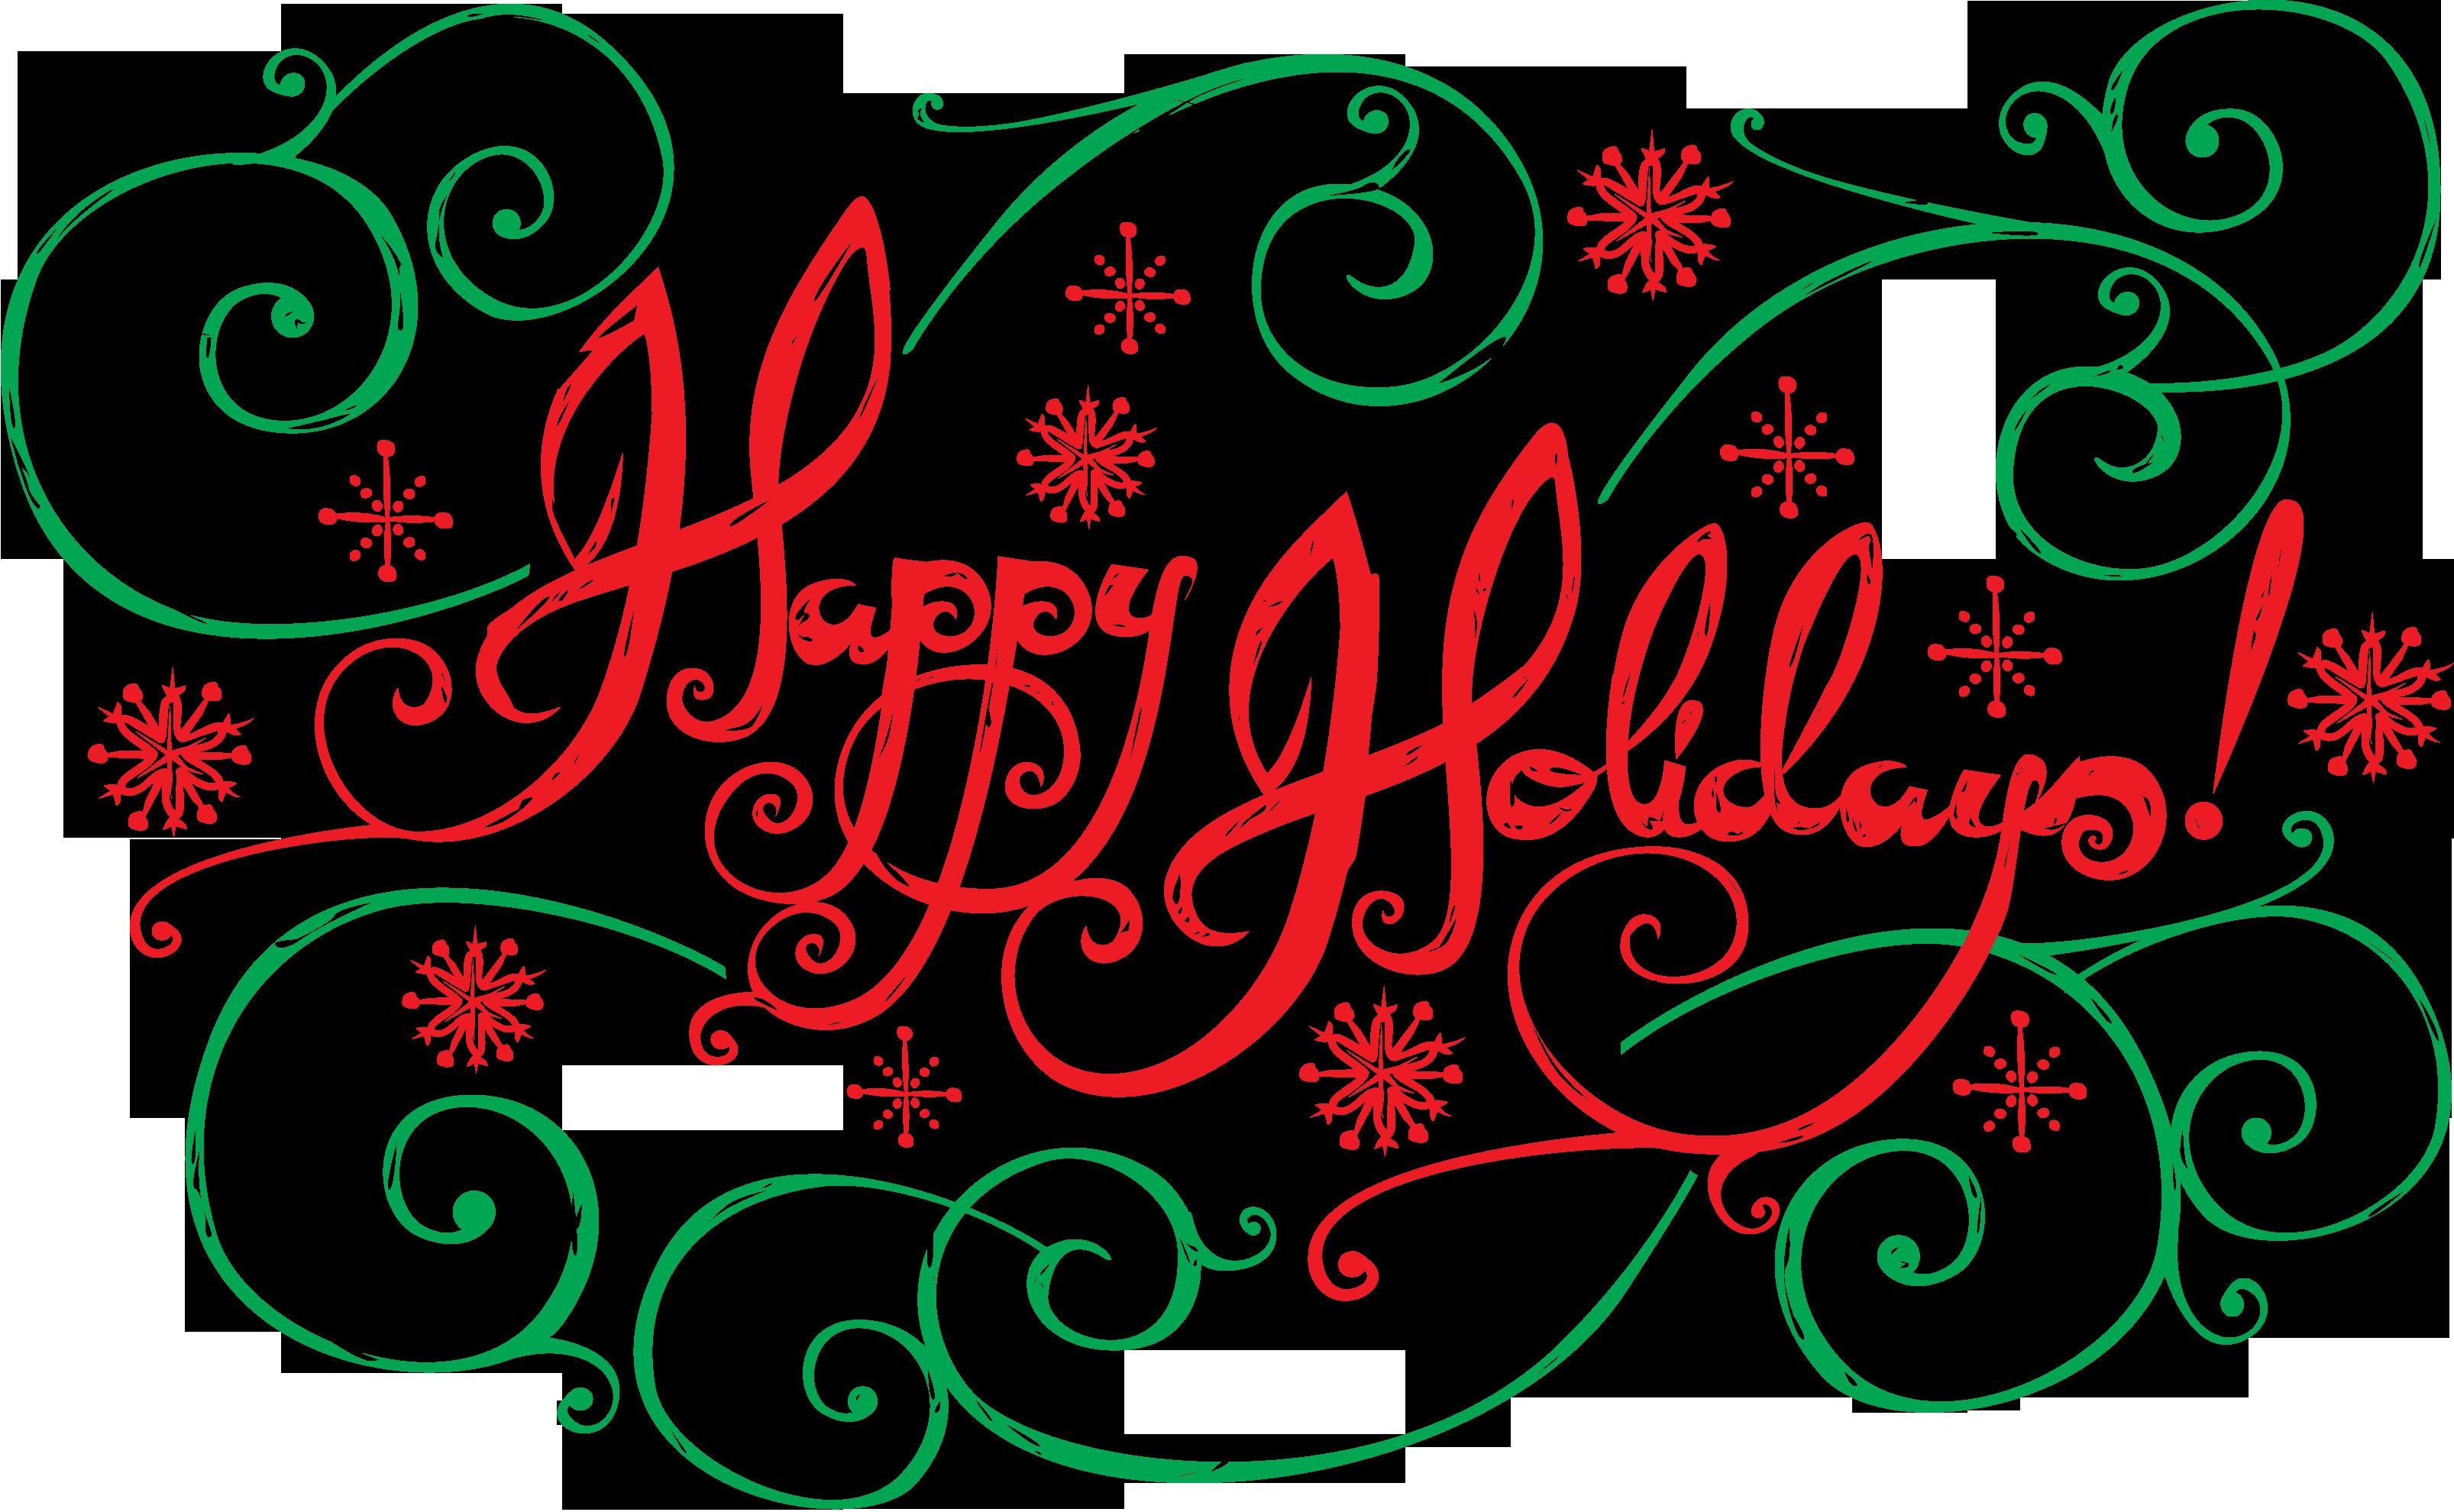 Desktop Wallpaper Christmas Holiday Clip art.